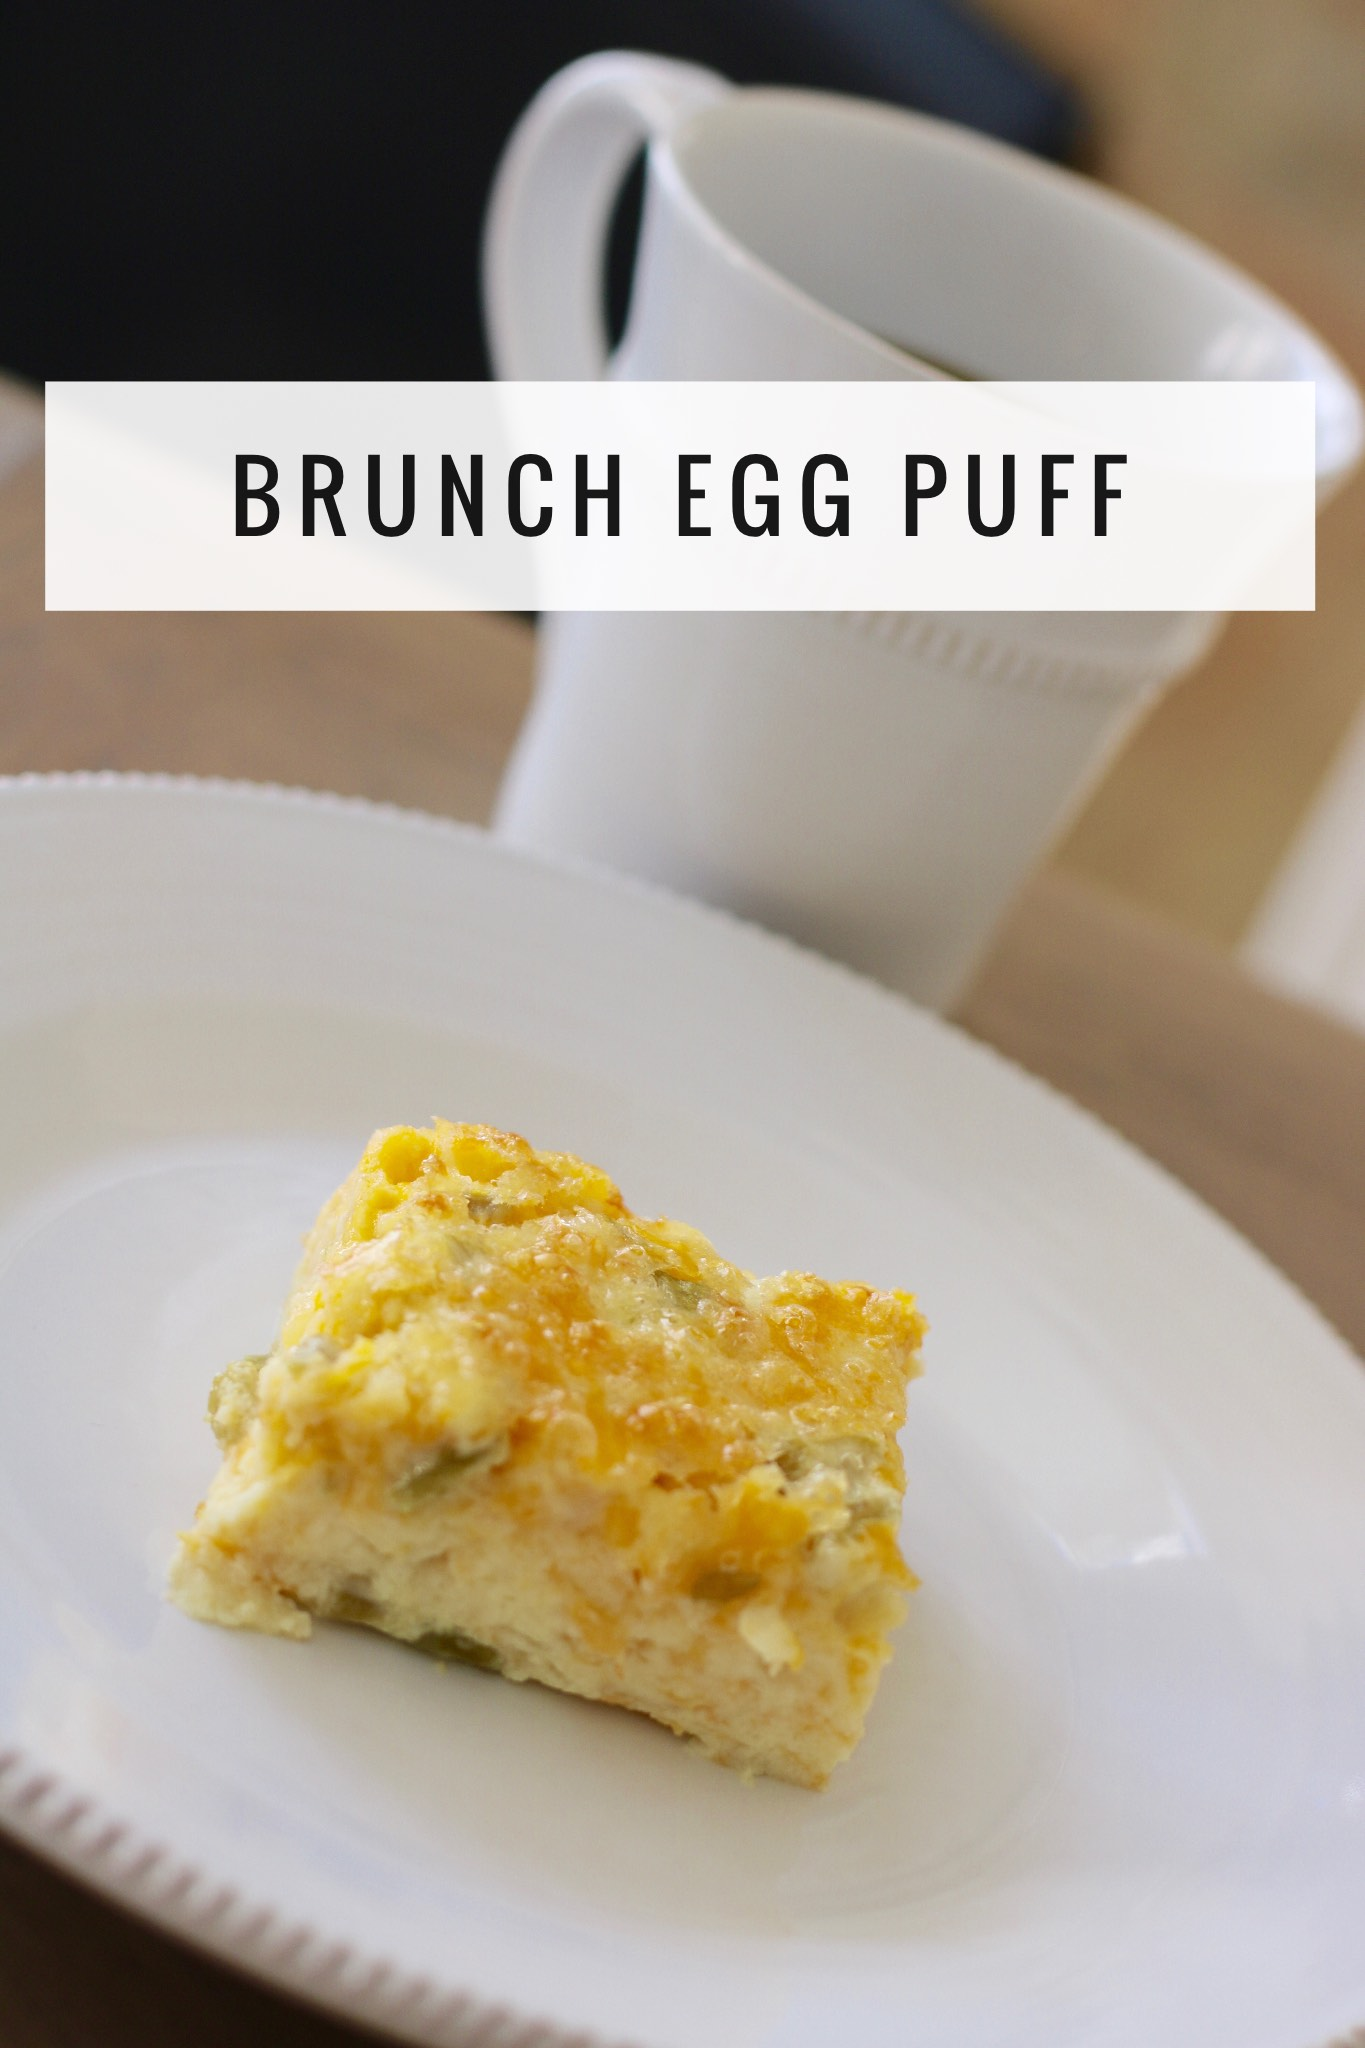 Brunch Egg Puff - #Thanksgiving #Recipe #Brunch #Casserole #breakfastcasserole #cheapbreakfast #easybreakfast